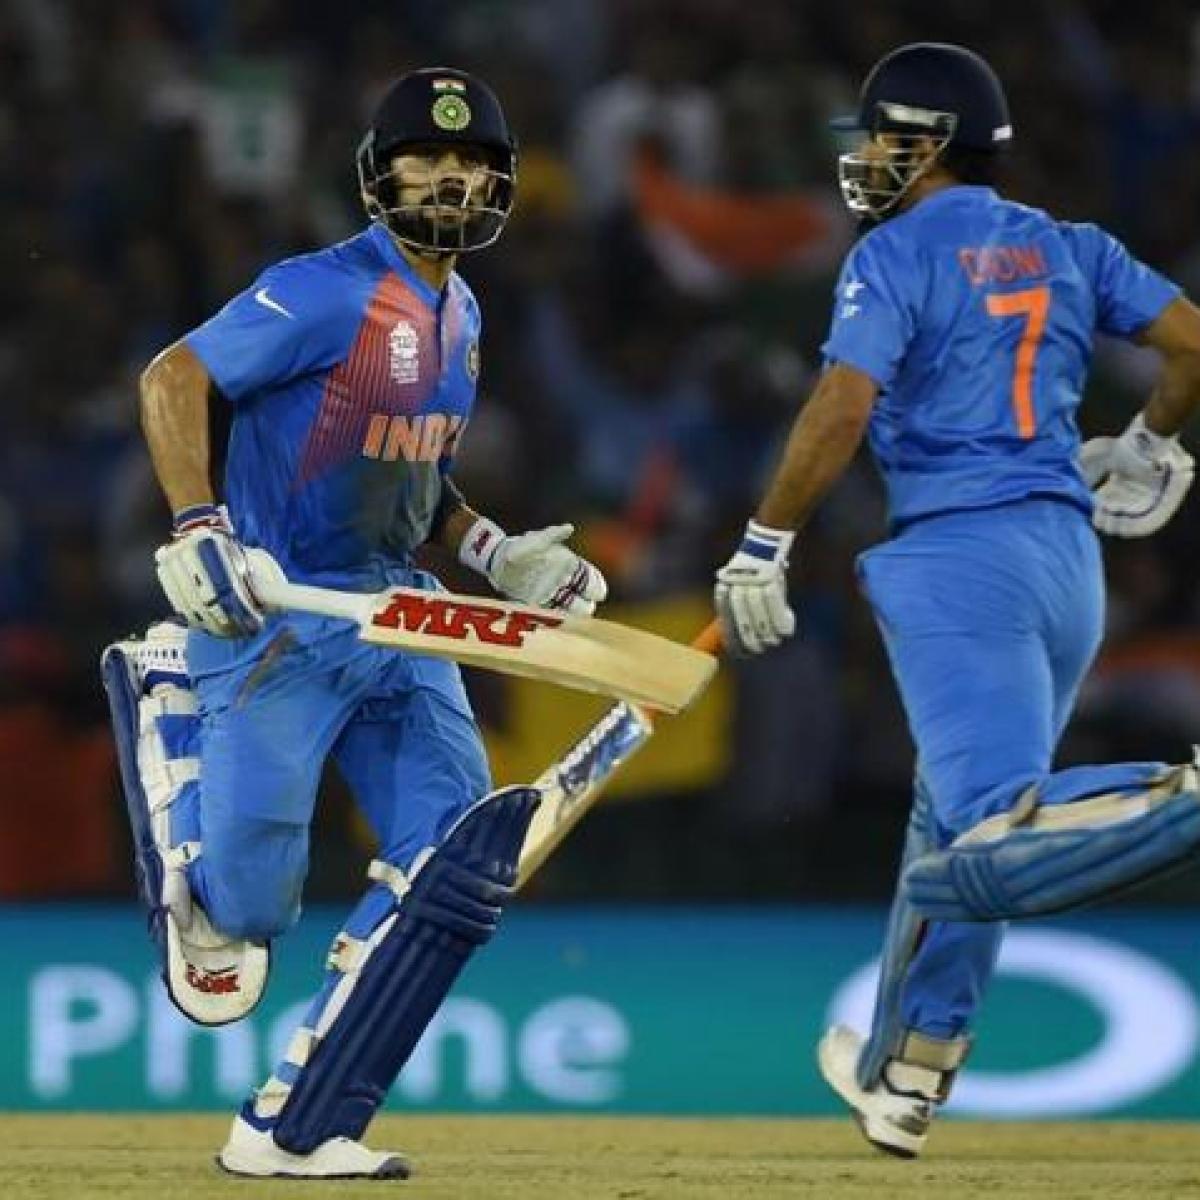 Ind vs Aus: Virat Kohli breaks MS Dhoni's captaincy record